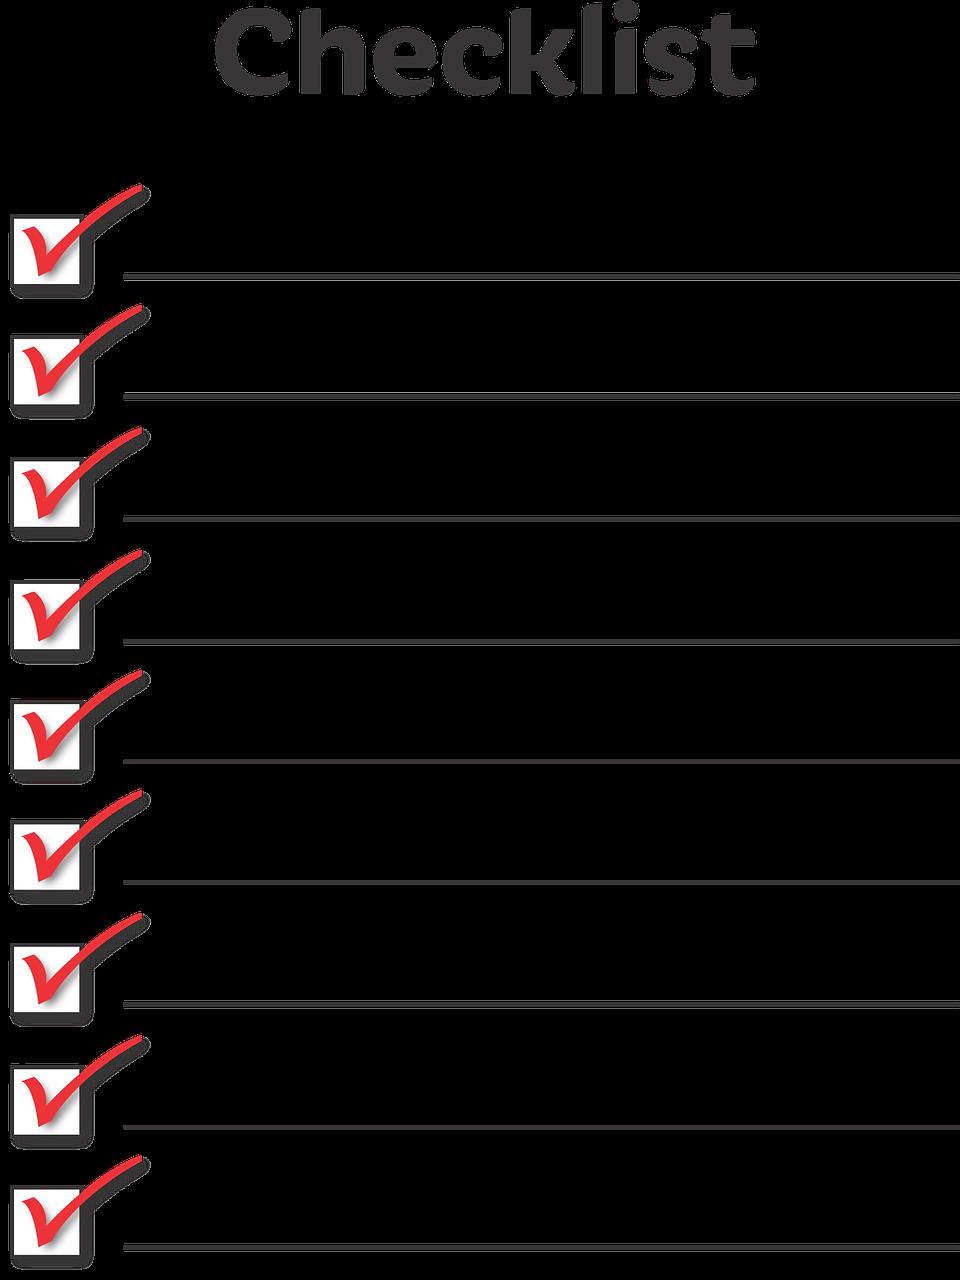 Checklist for Evaluating a Potential Niche